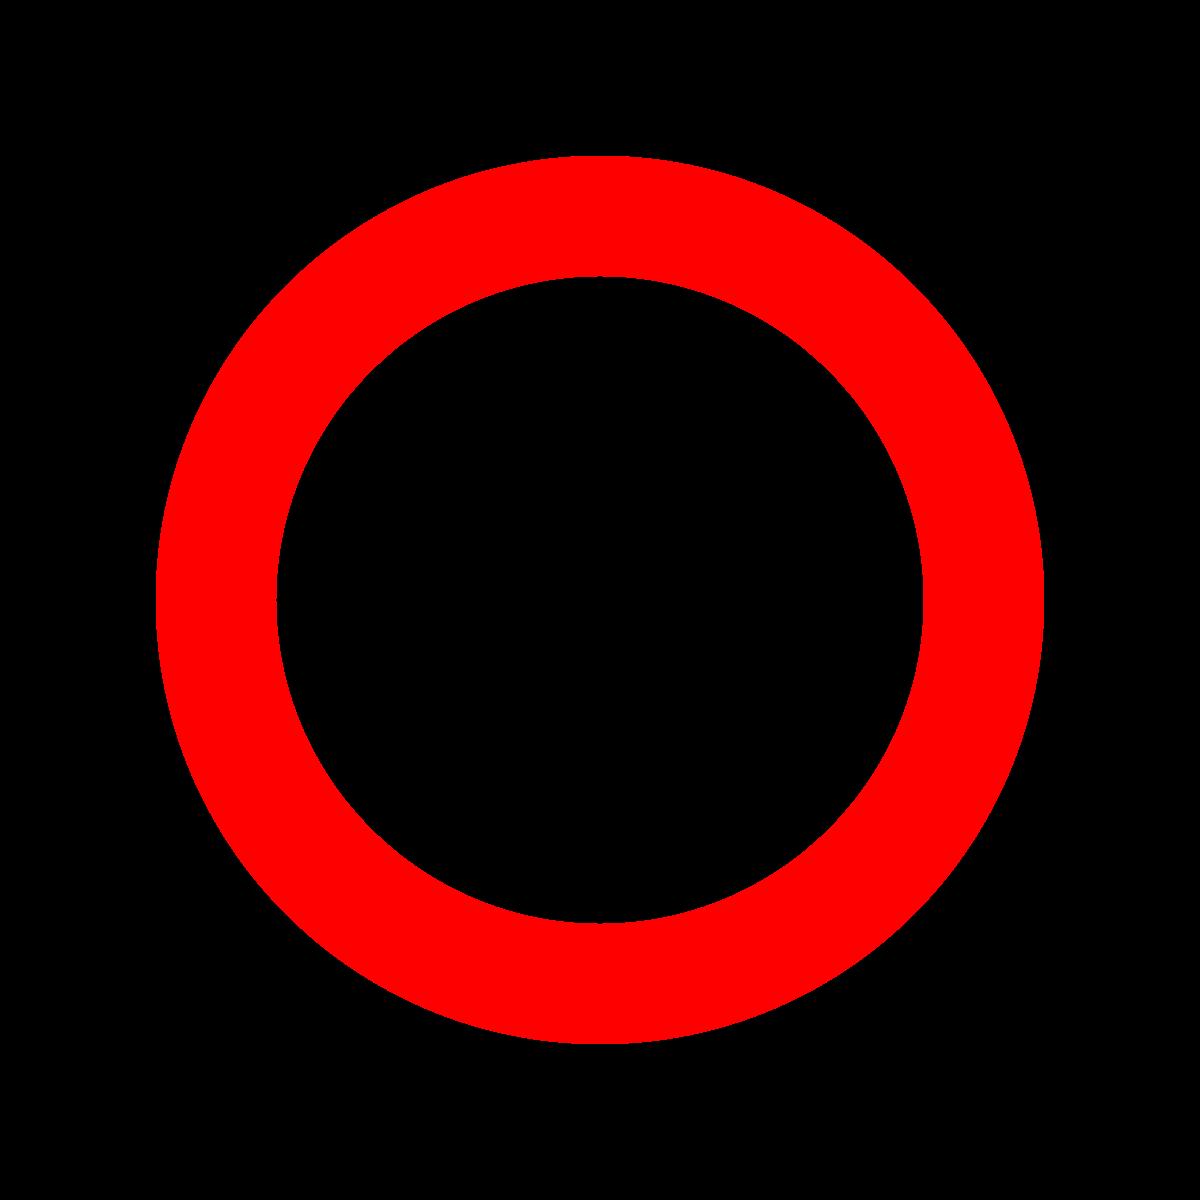 White Red Circle png